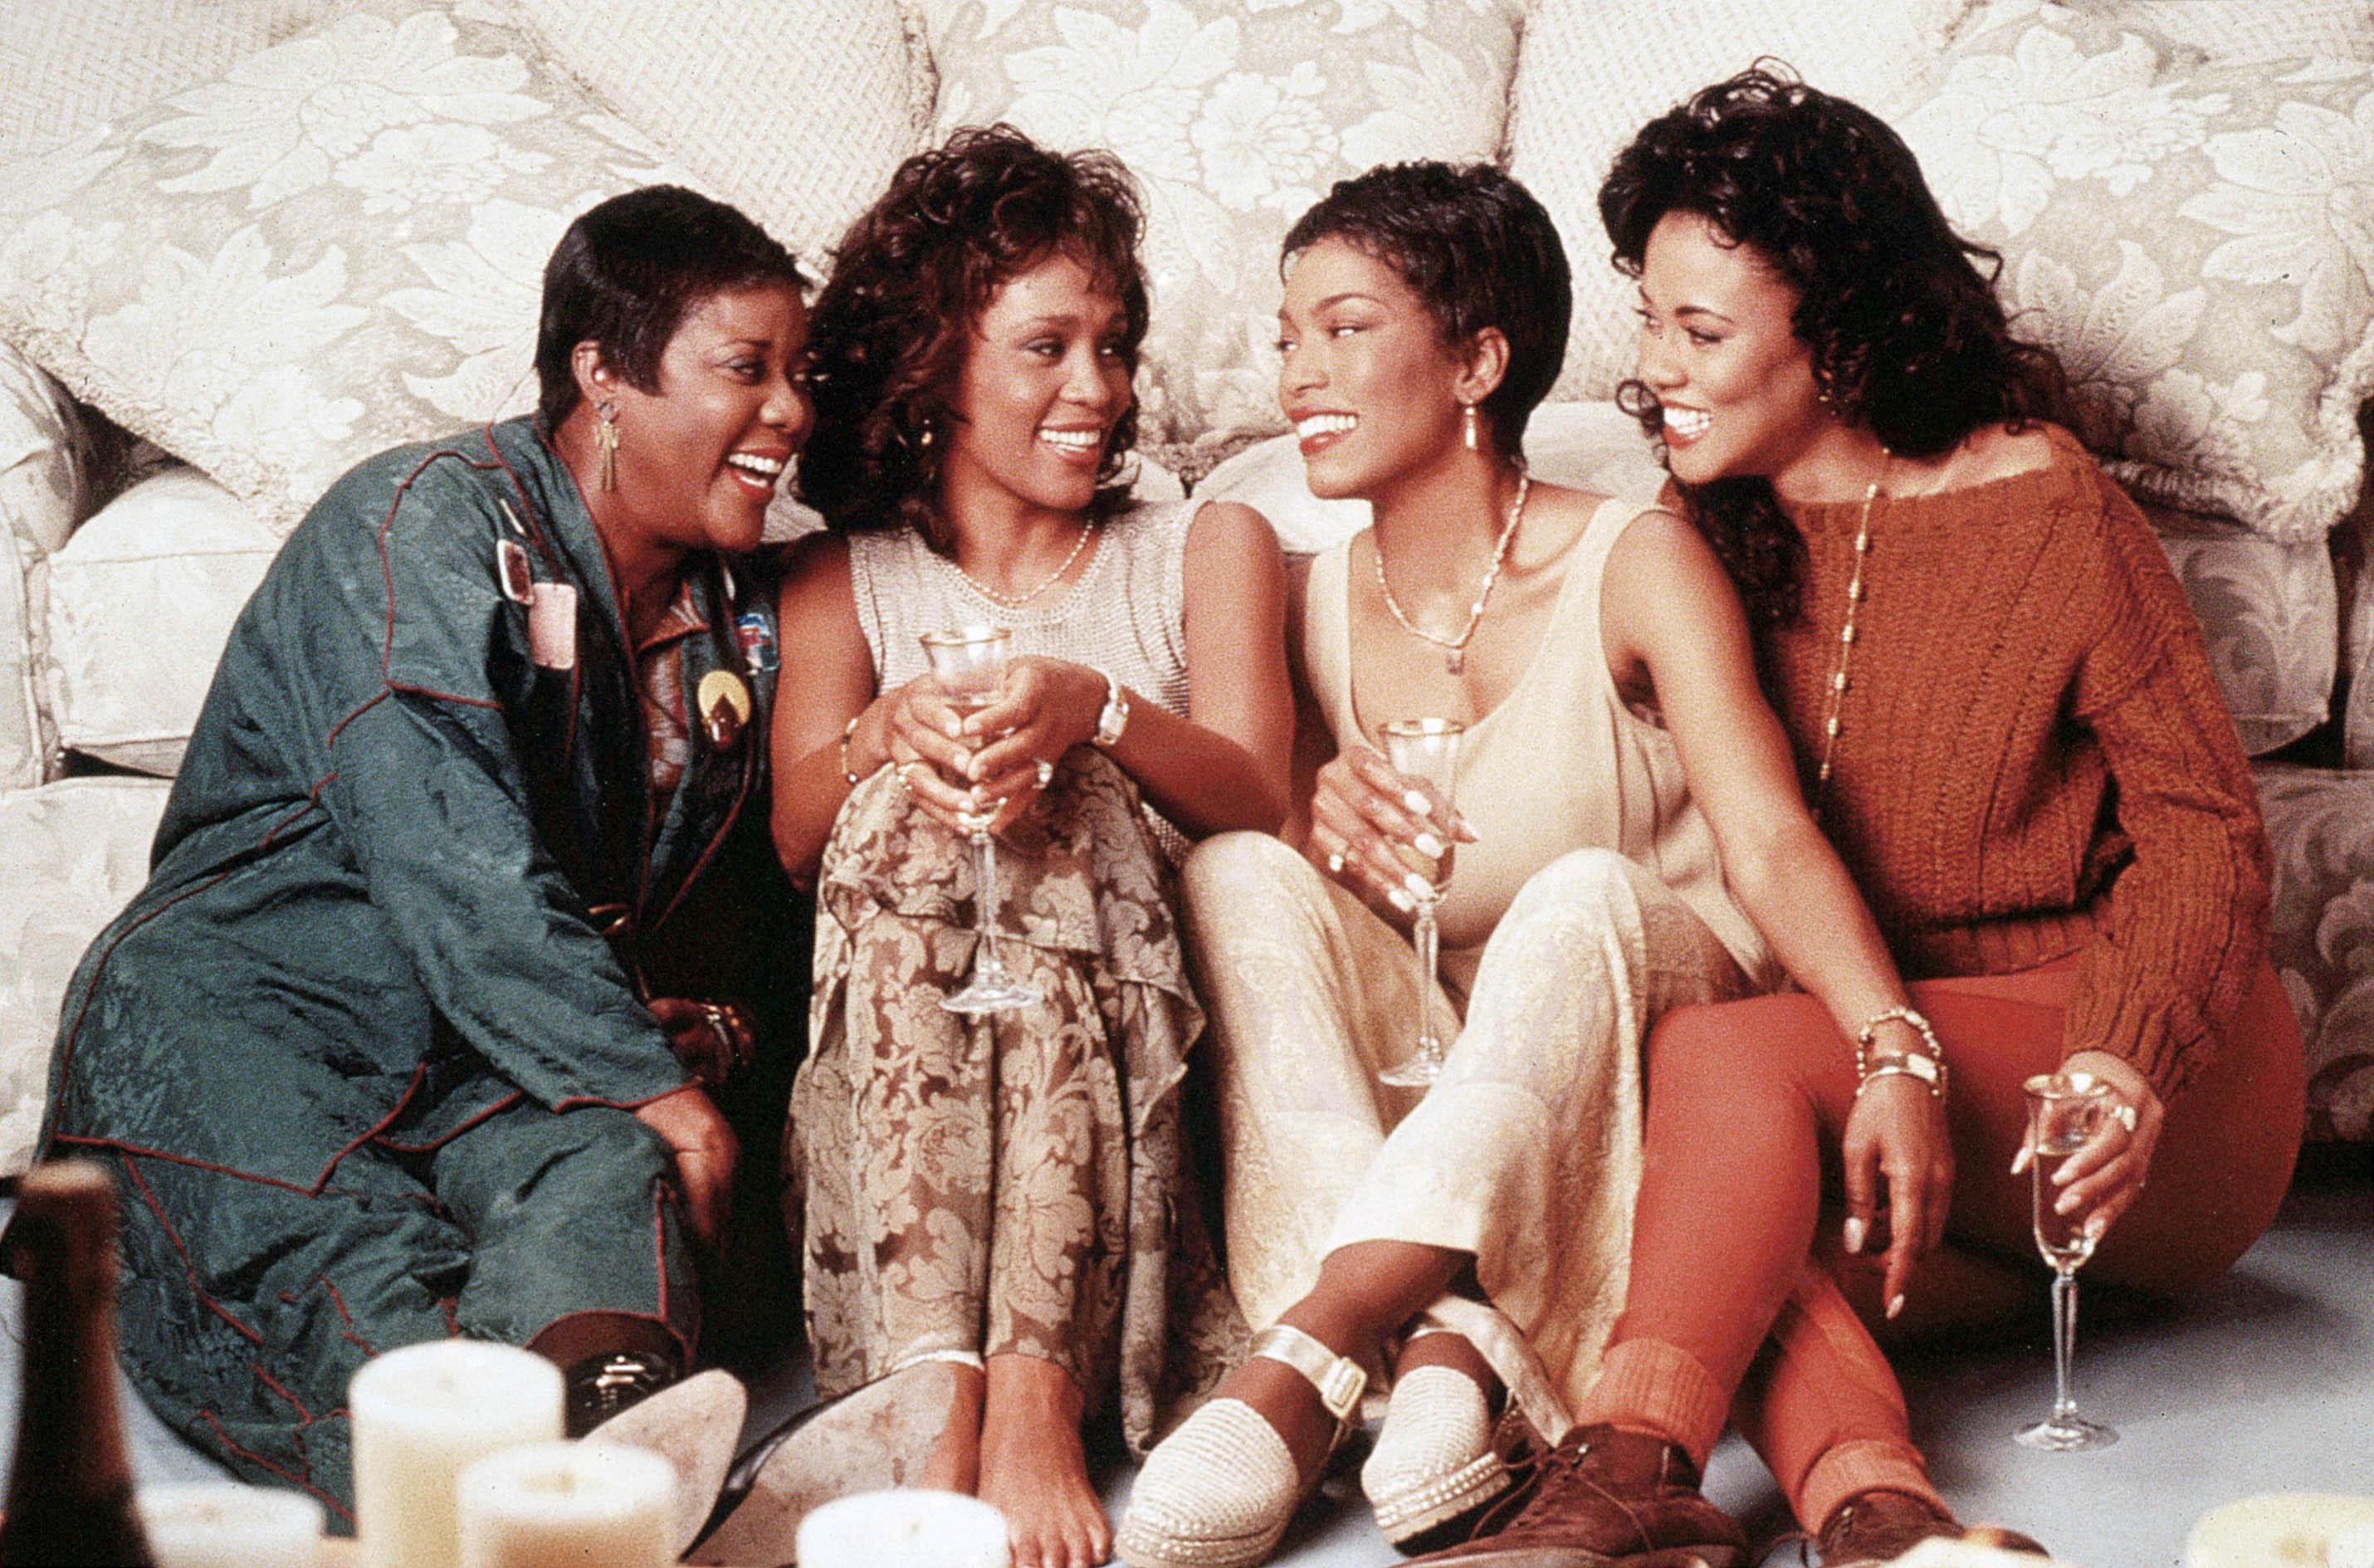 Loretta Devine, Whitney Houston, Angela Bassett, Lela Rochon, Waiting to Exhale